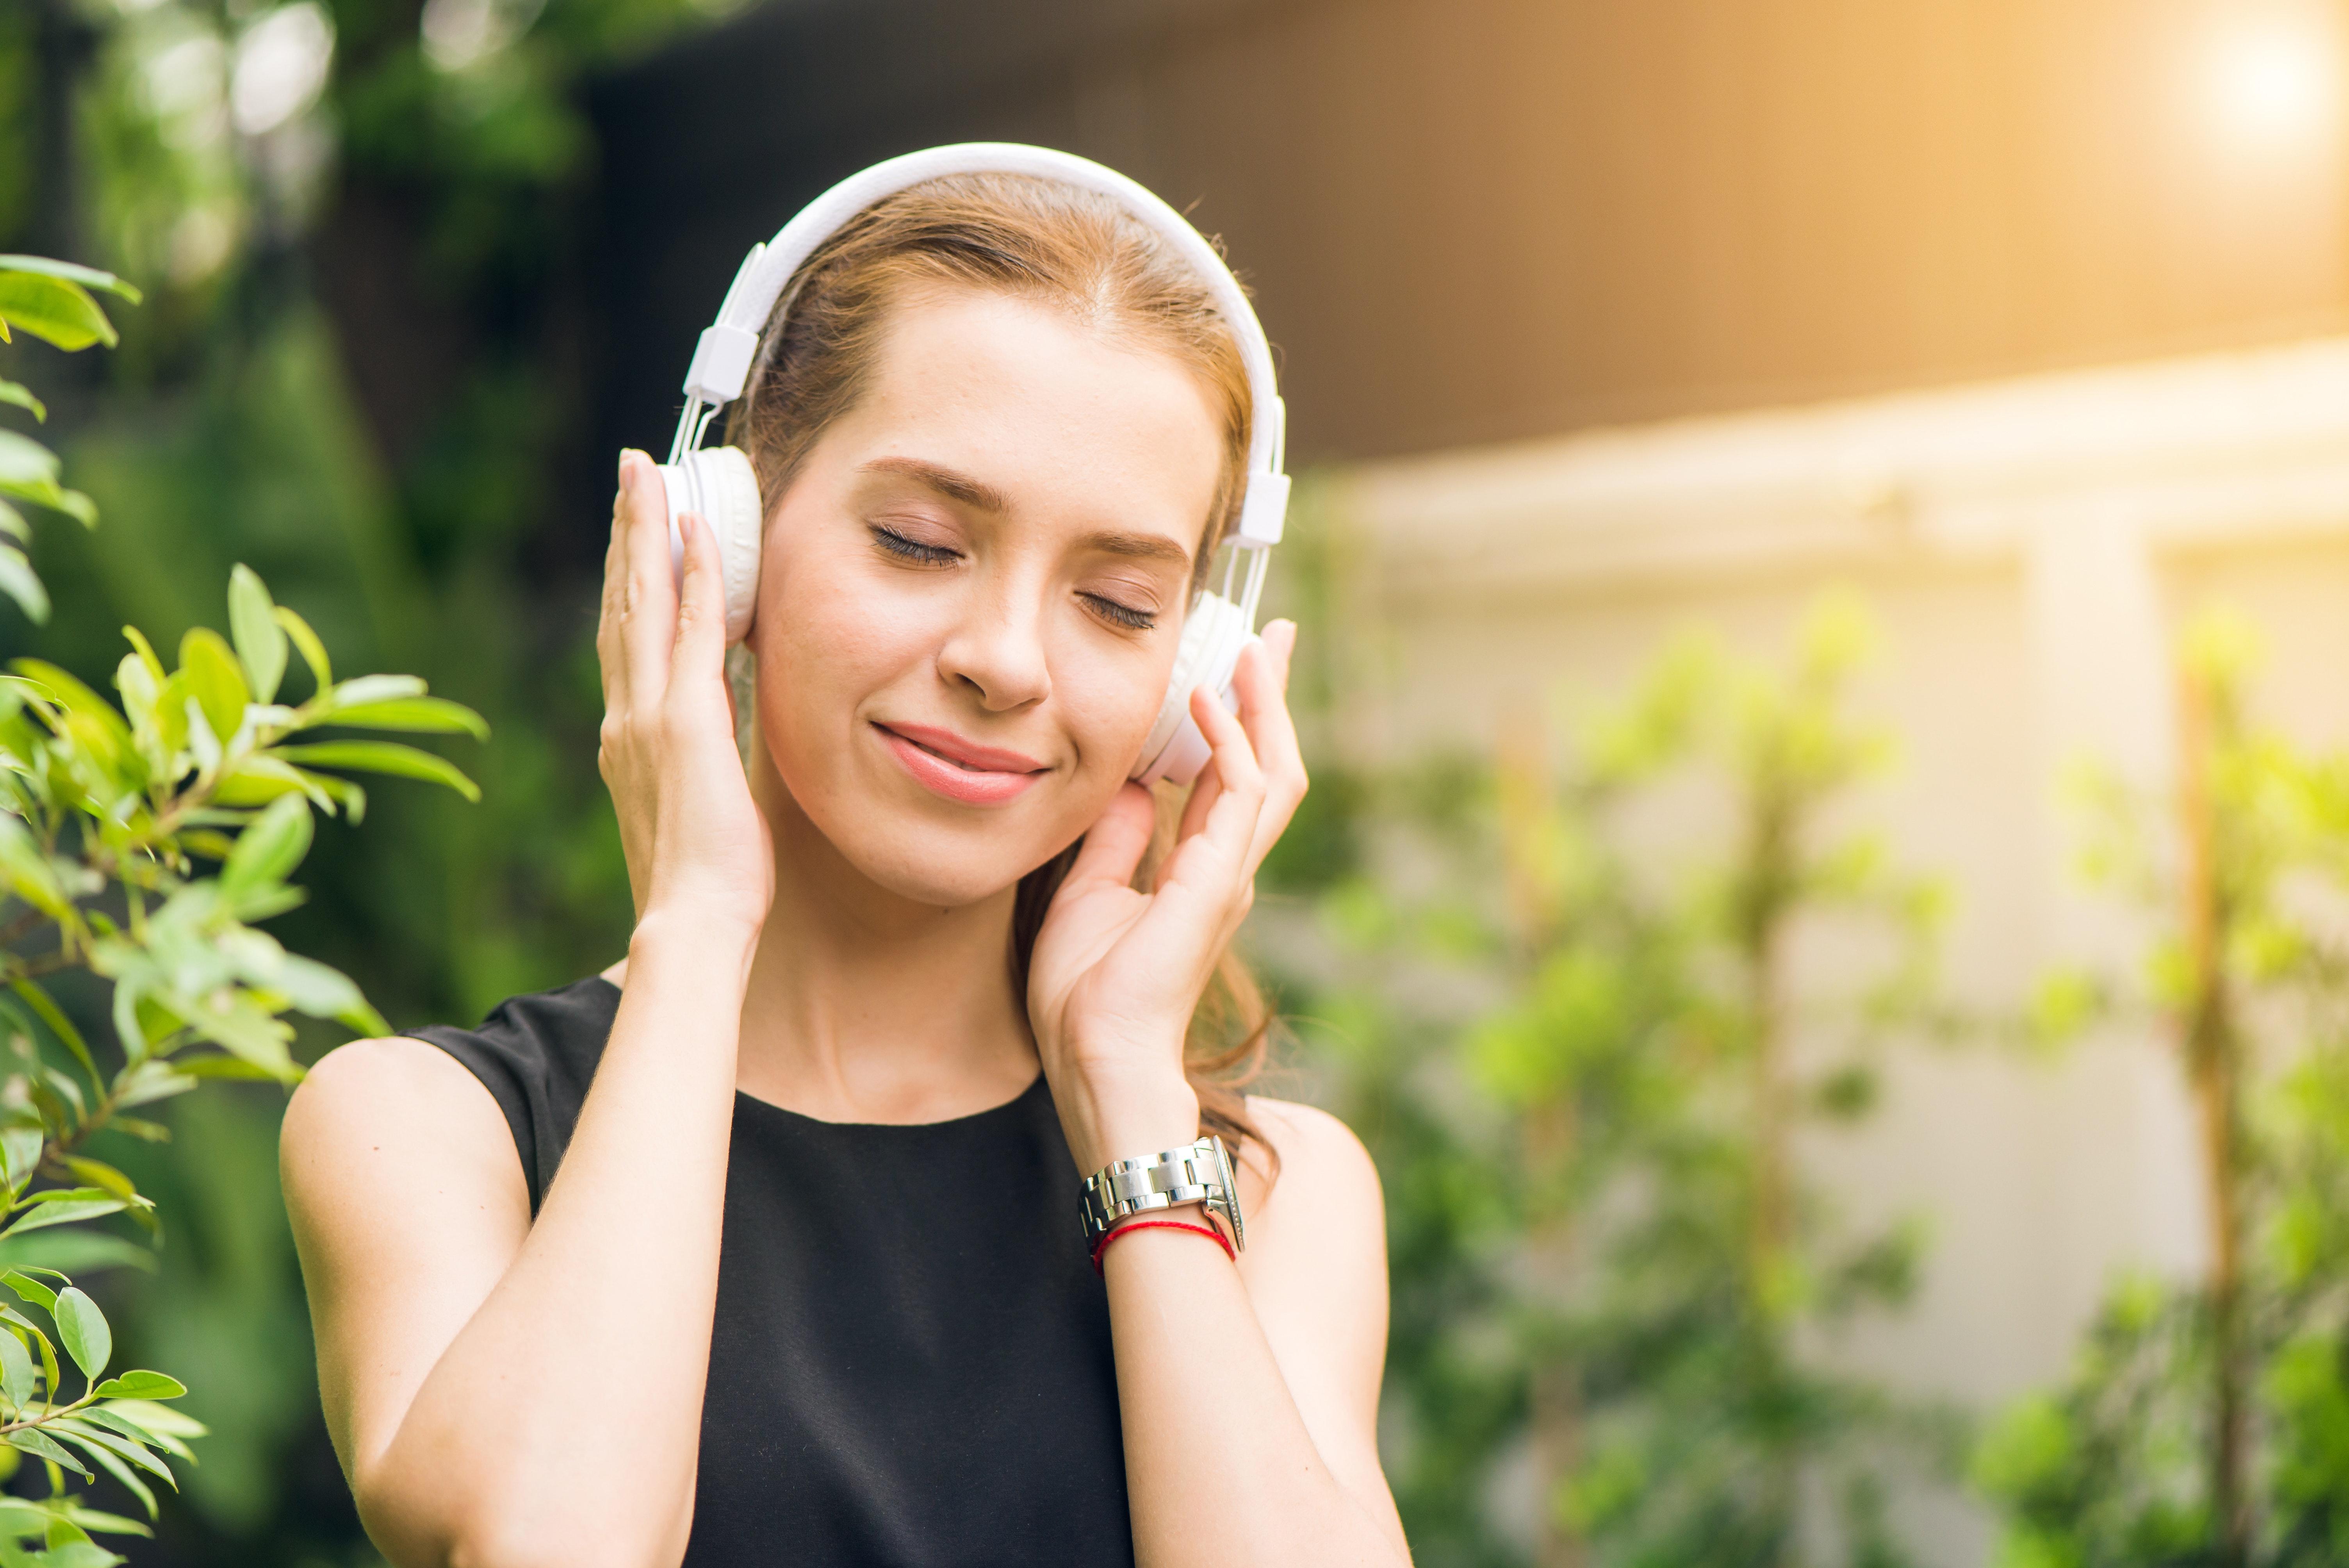 woman-wearing-black-sleeveless-dress-holding-white-headphone